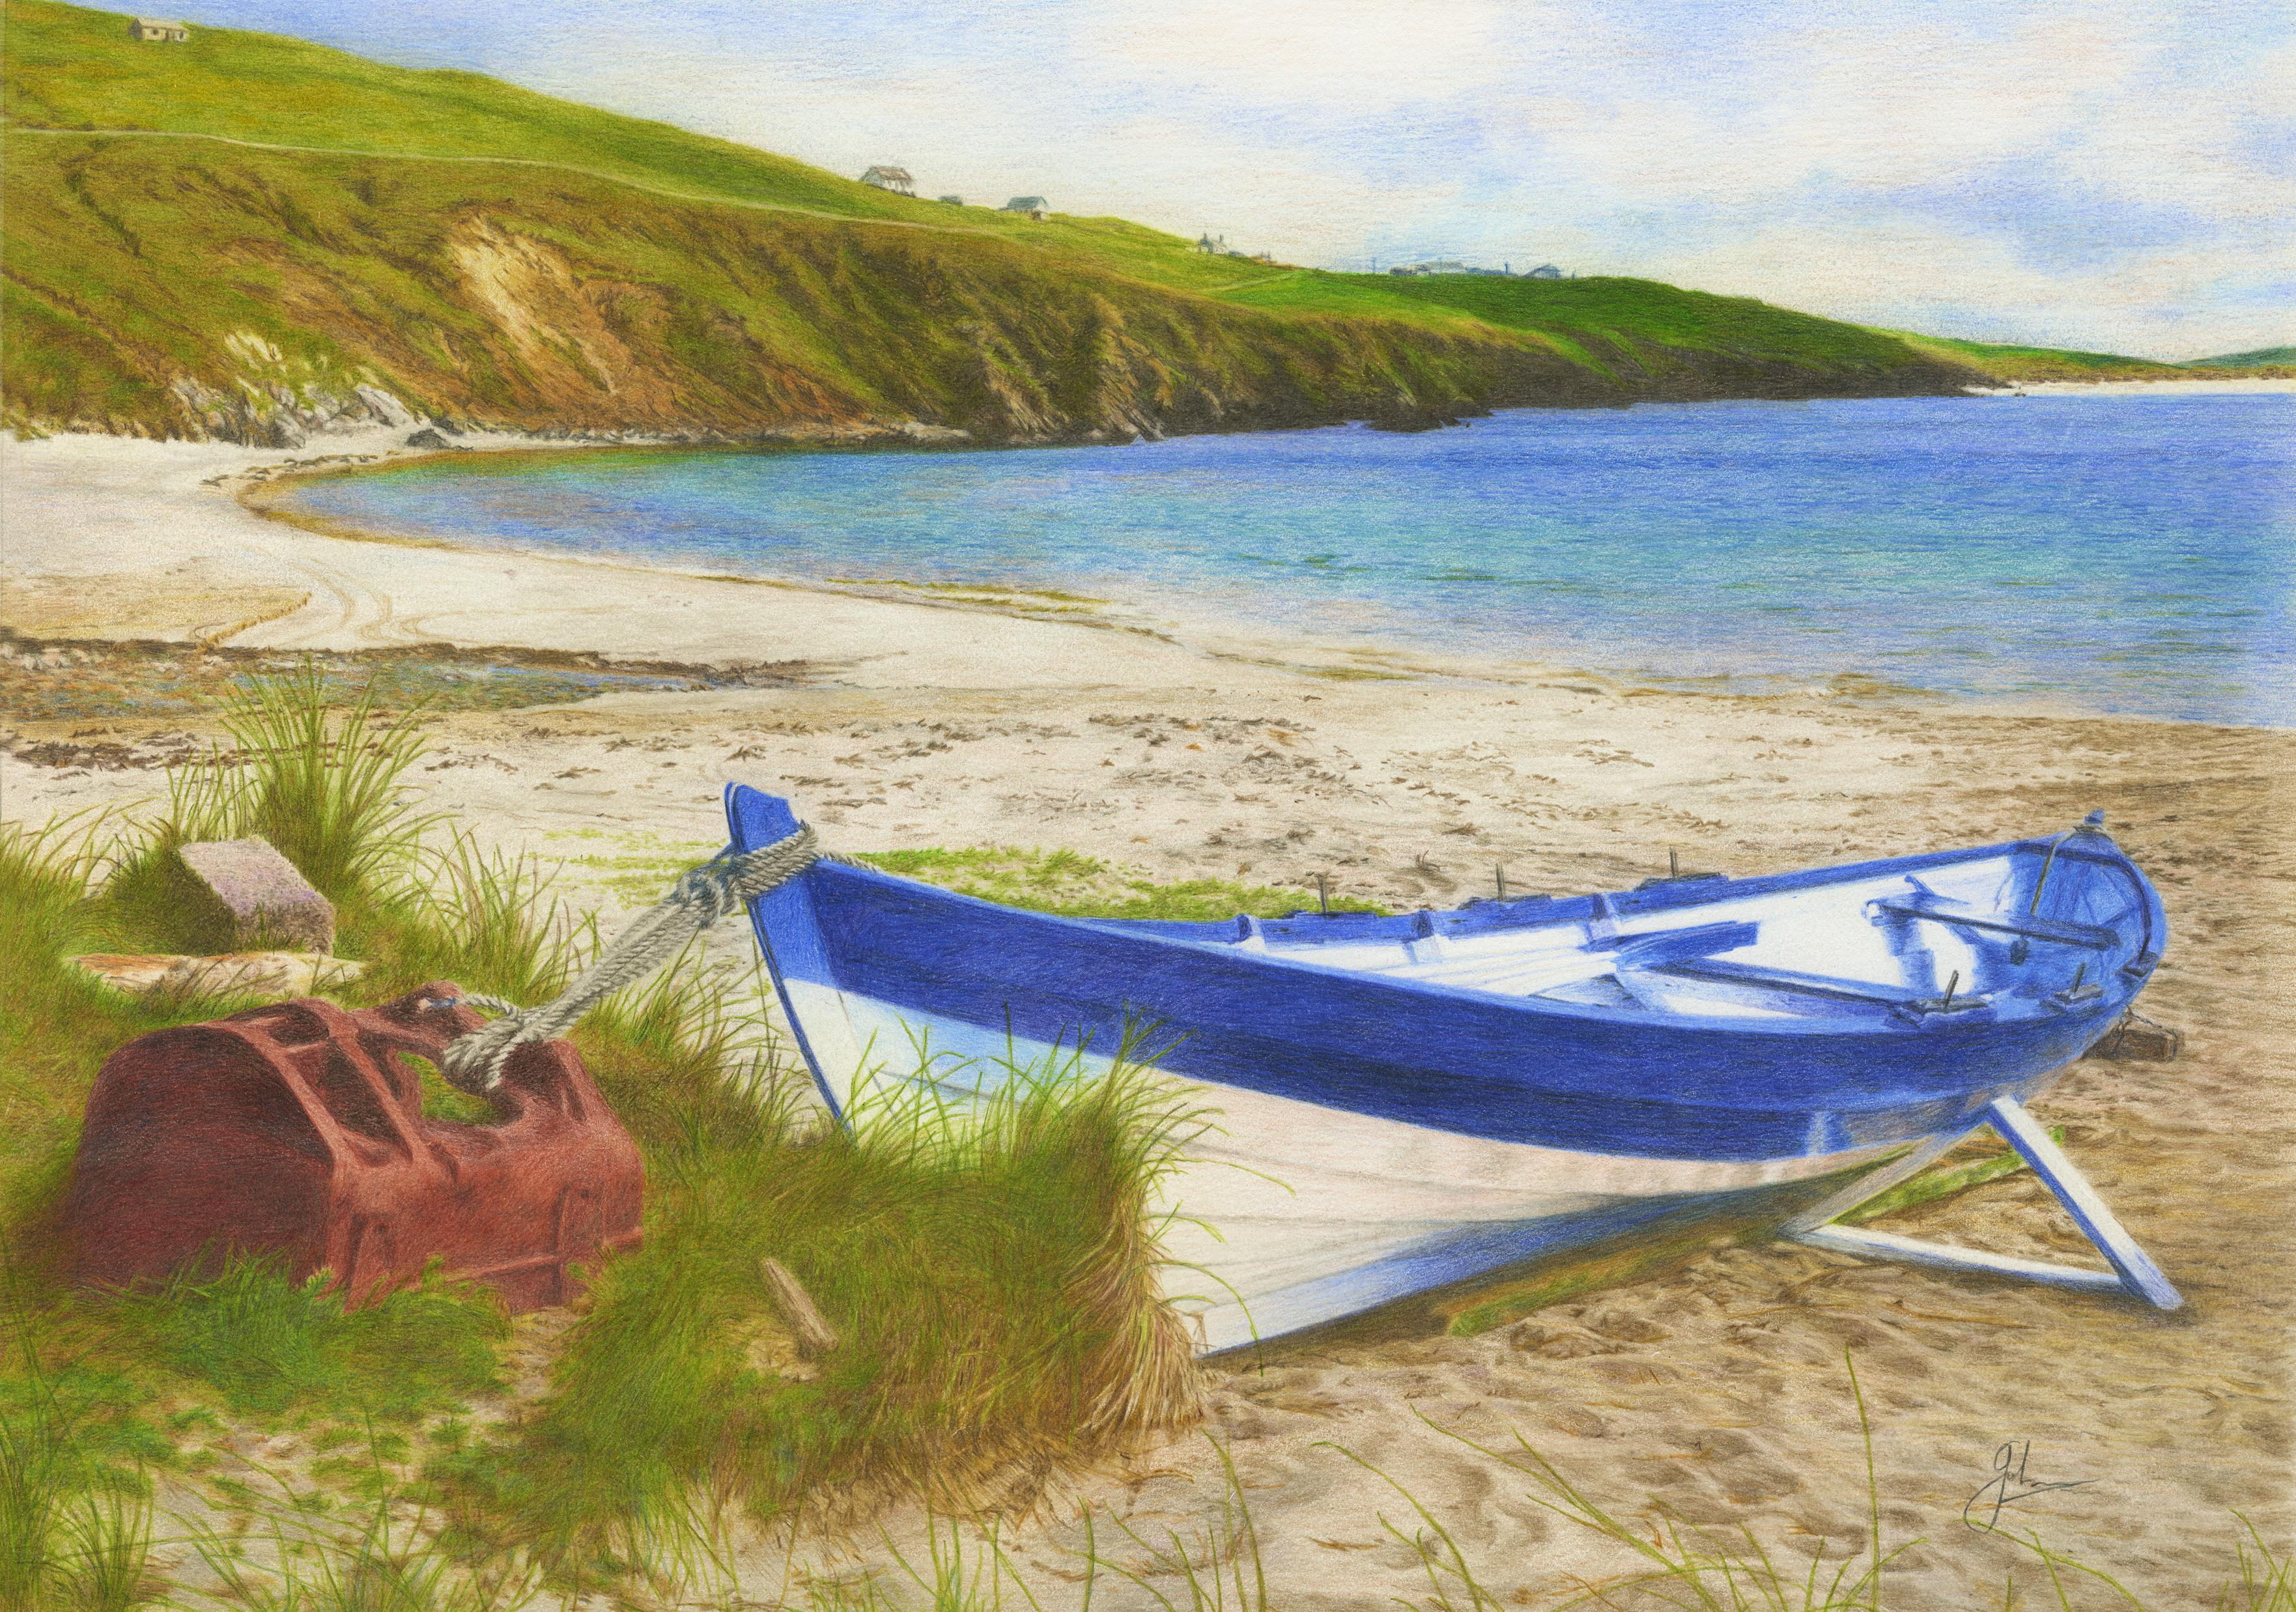 Ness Yoal 'Rerwick Beach' Shetland